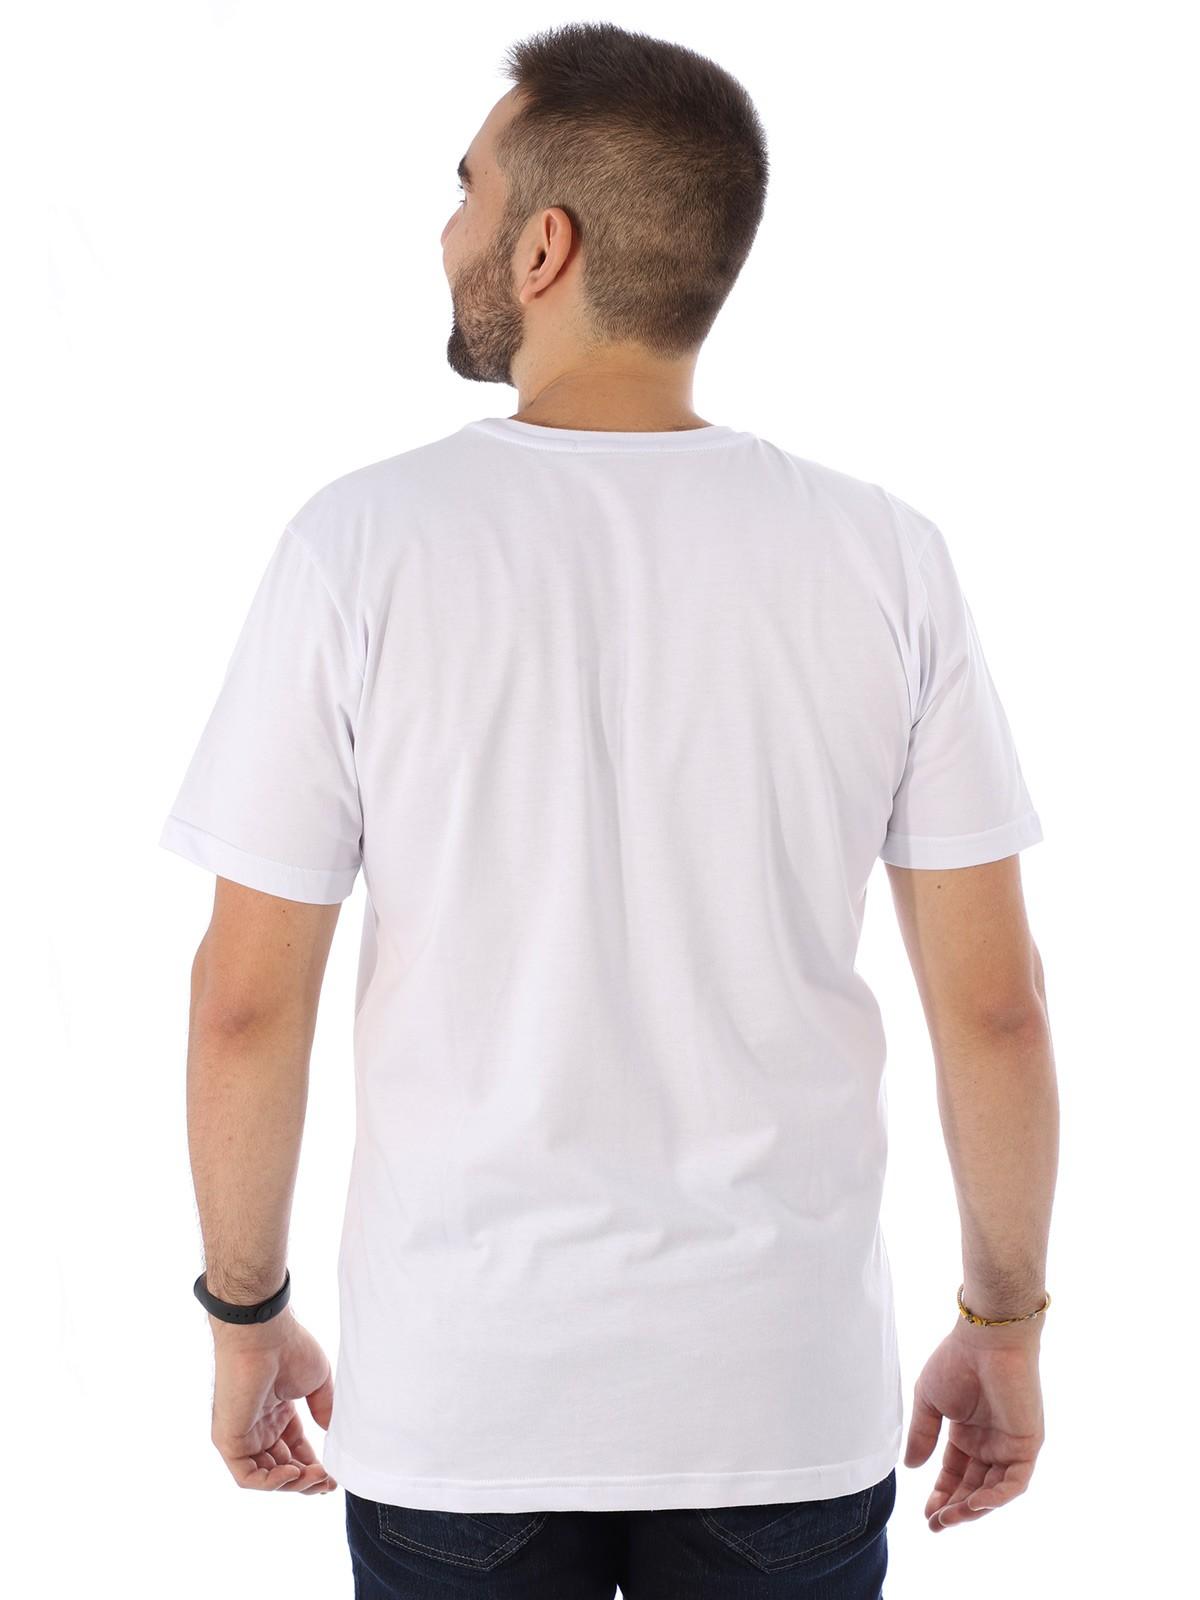 Camiseta Masculina Manga Curta Básica Floral Branco